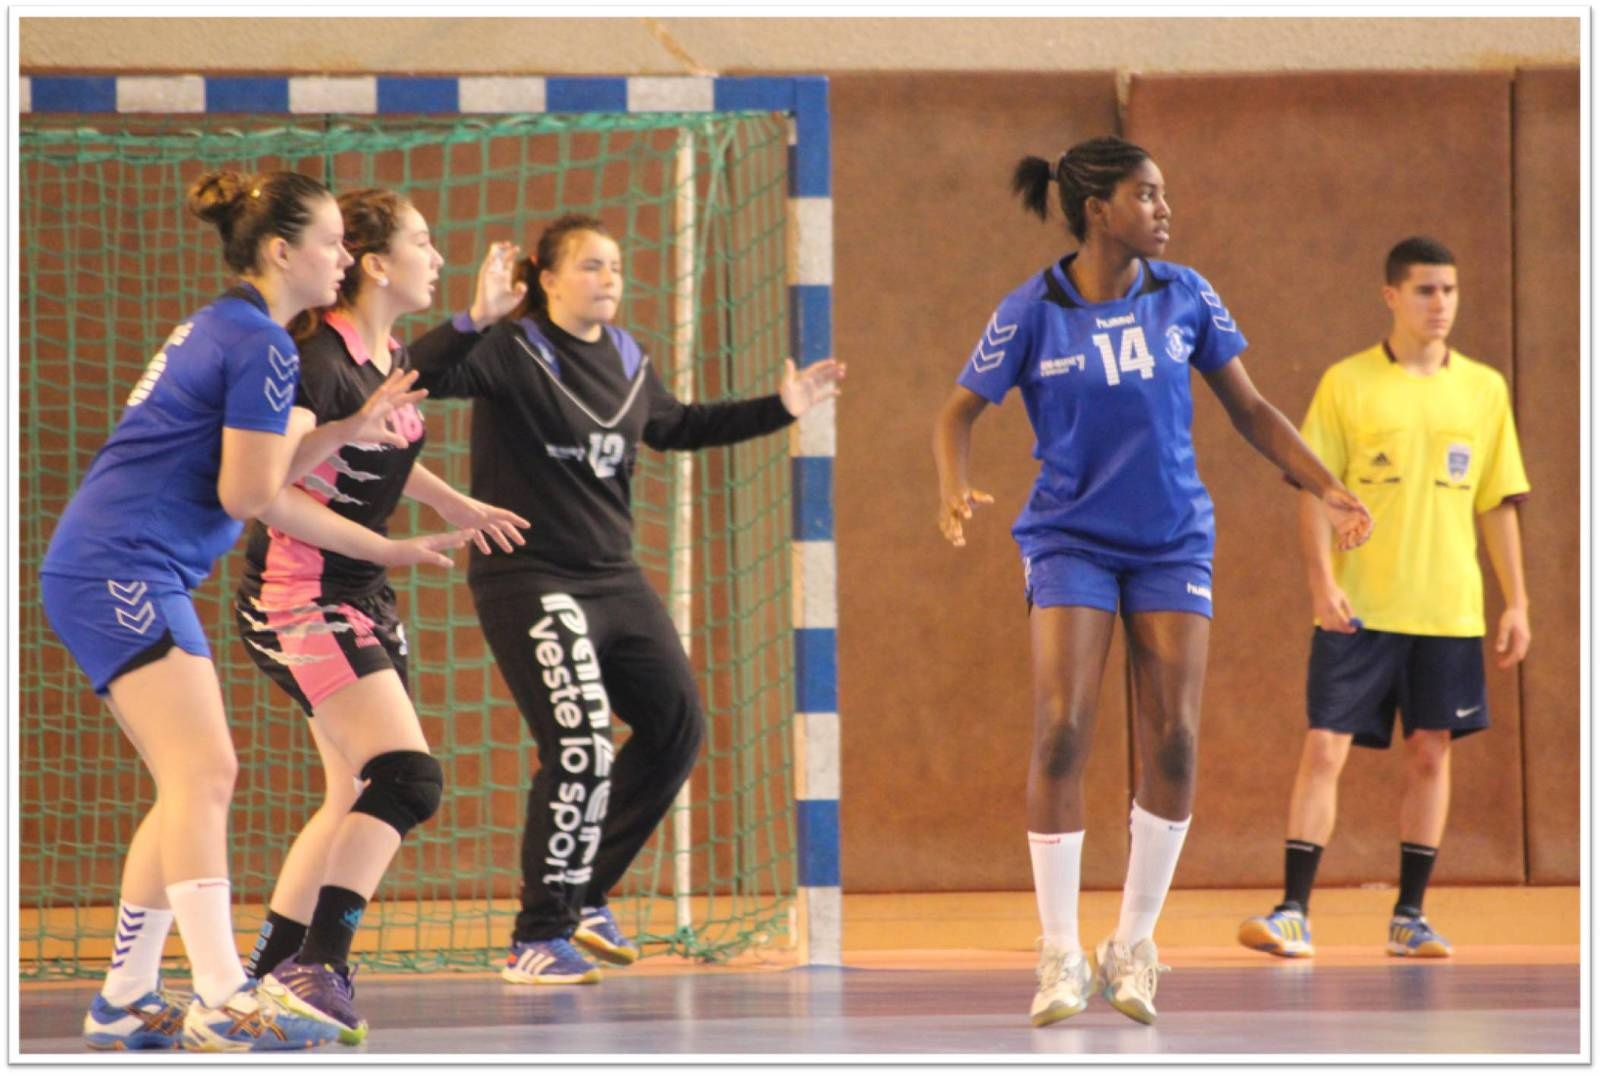 Inter-Comités Féminins (Torcy 01.11.2014) 2/3